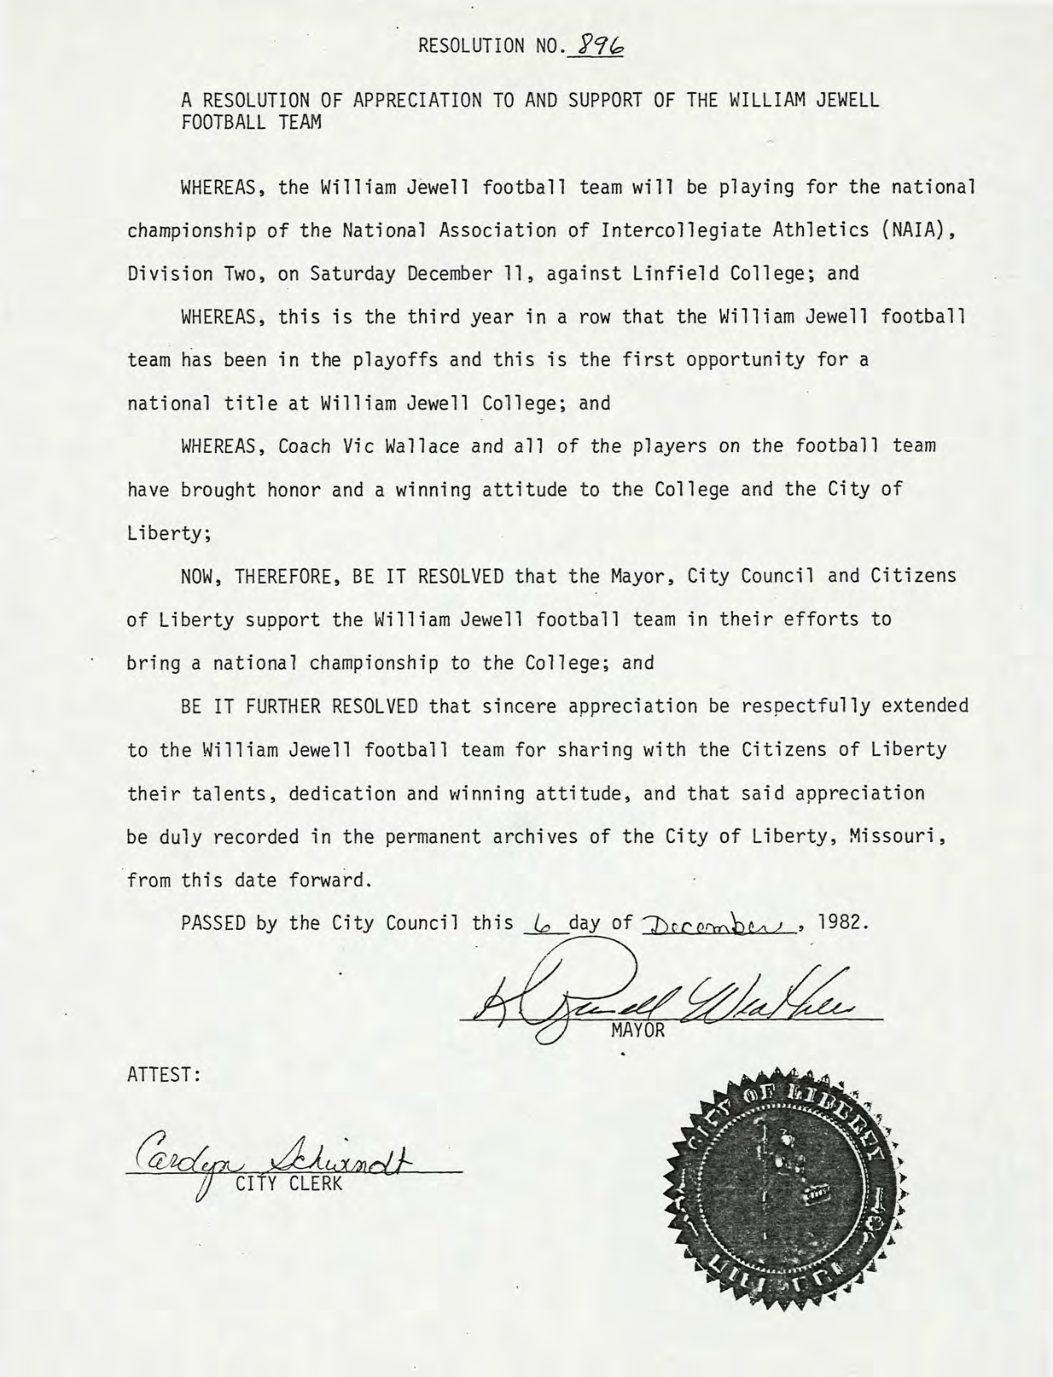 1982 Resolution of Appreciation